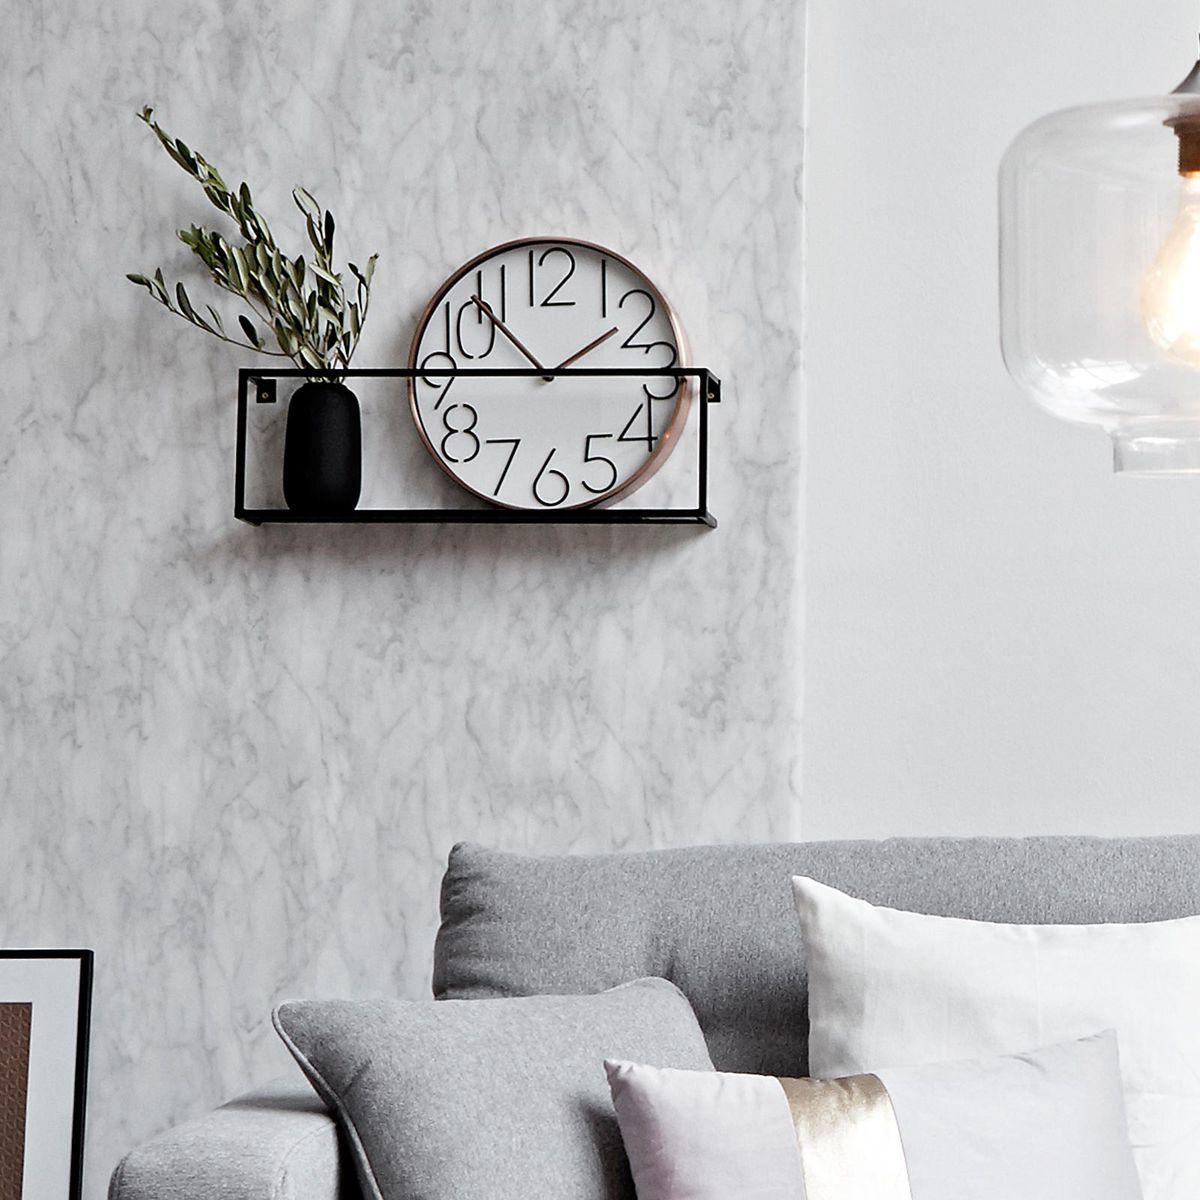 wandregal aus metall b 50 x h 16 x t 8cm schwarz schwarz living pinterest. Black Bedroom Furniture Sets. Home Design Ideas